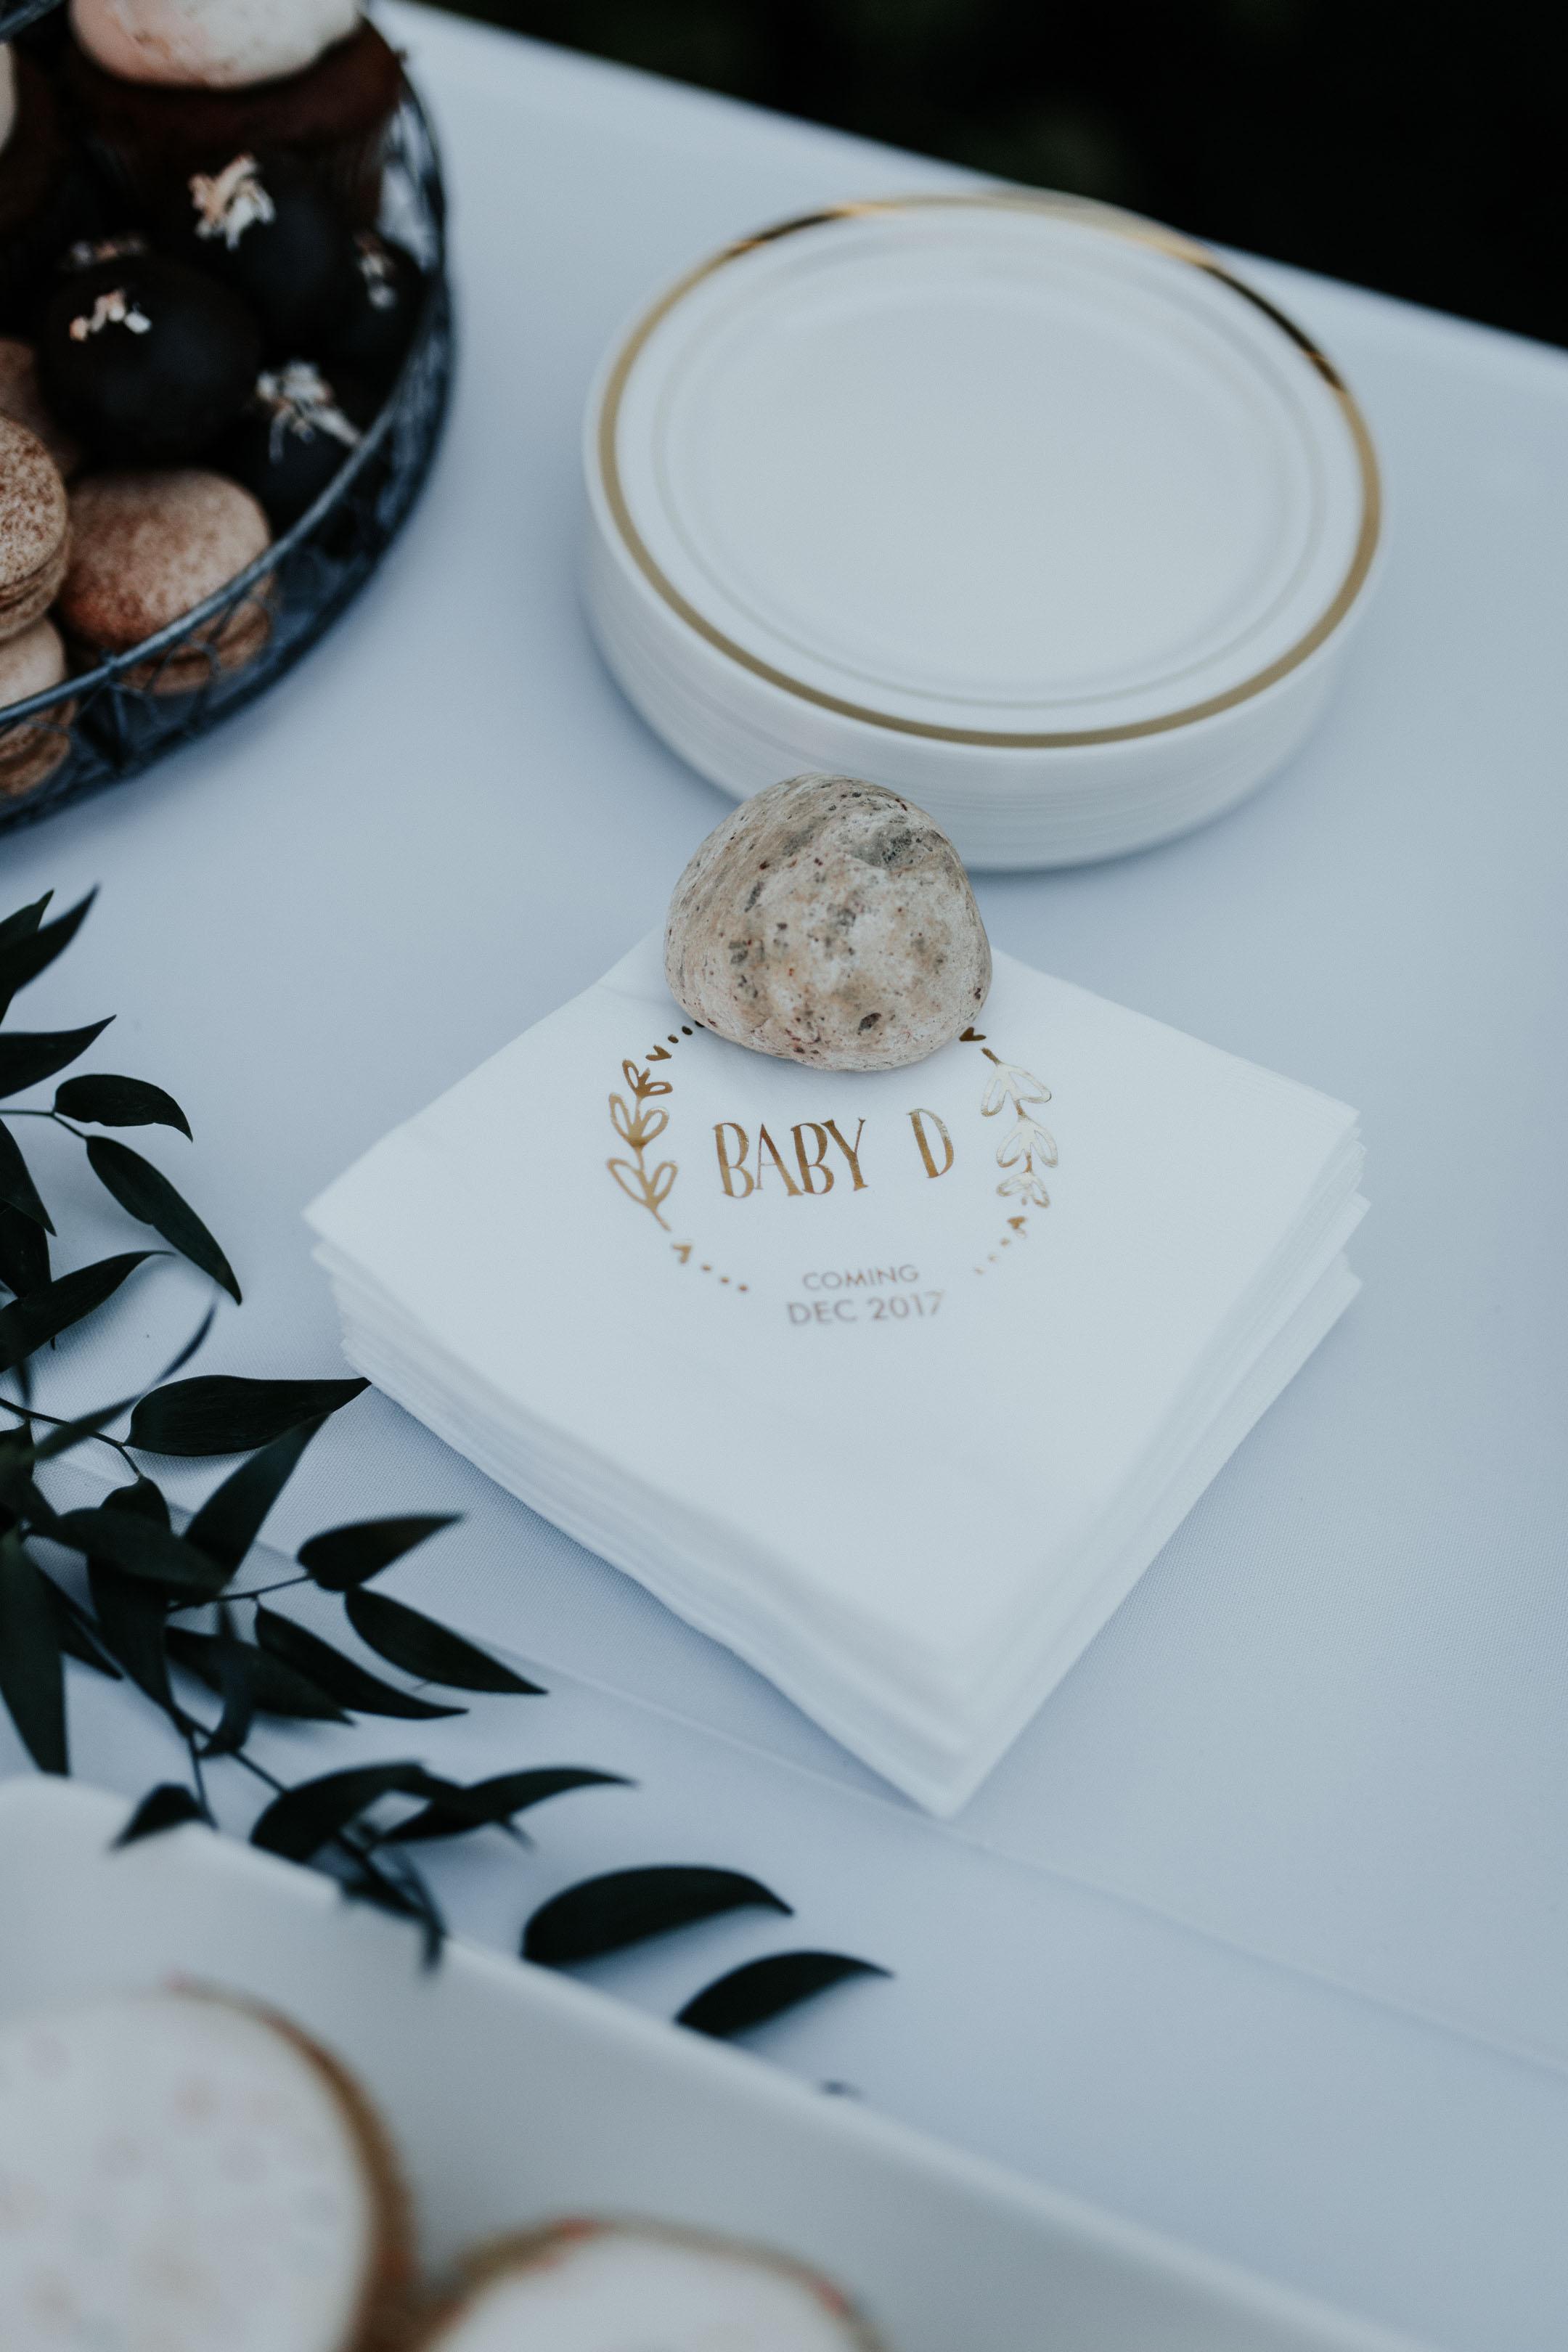 Baby D custom napkins